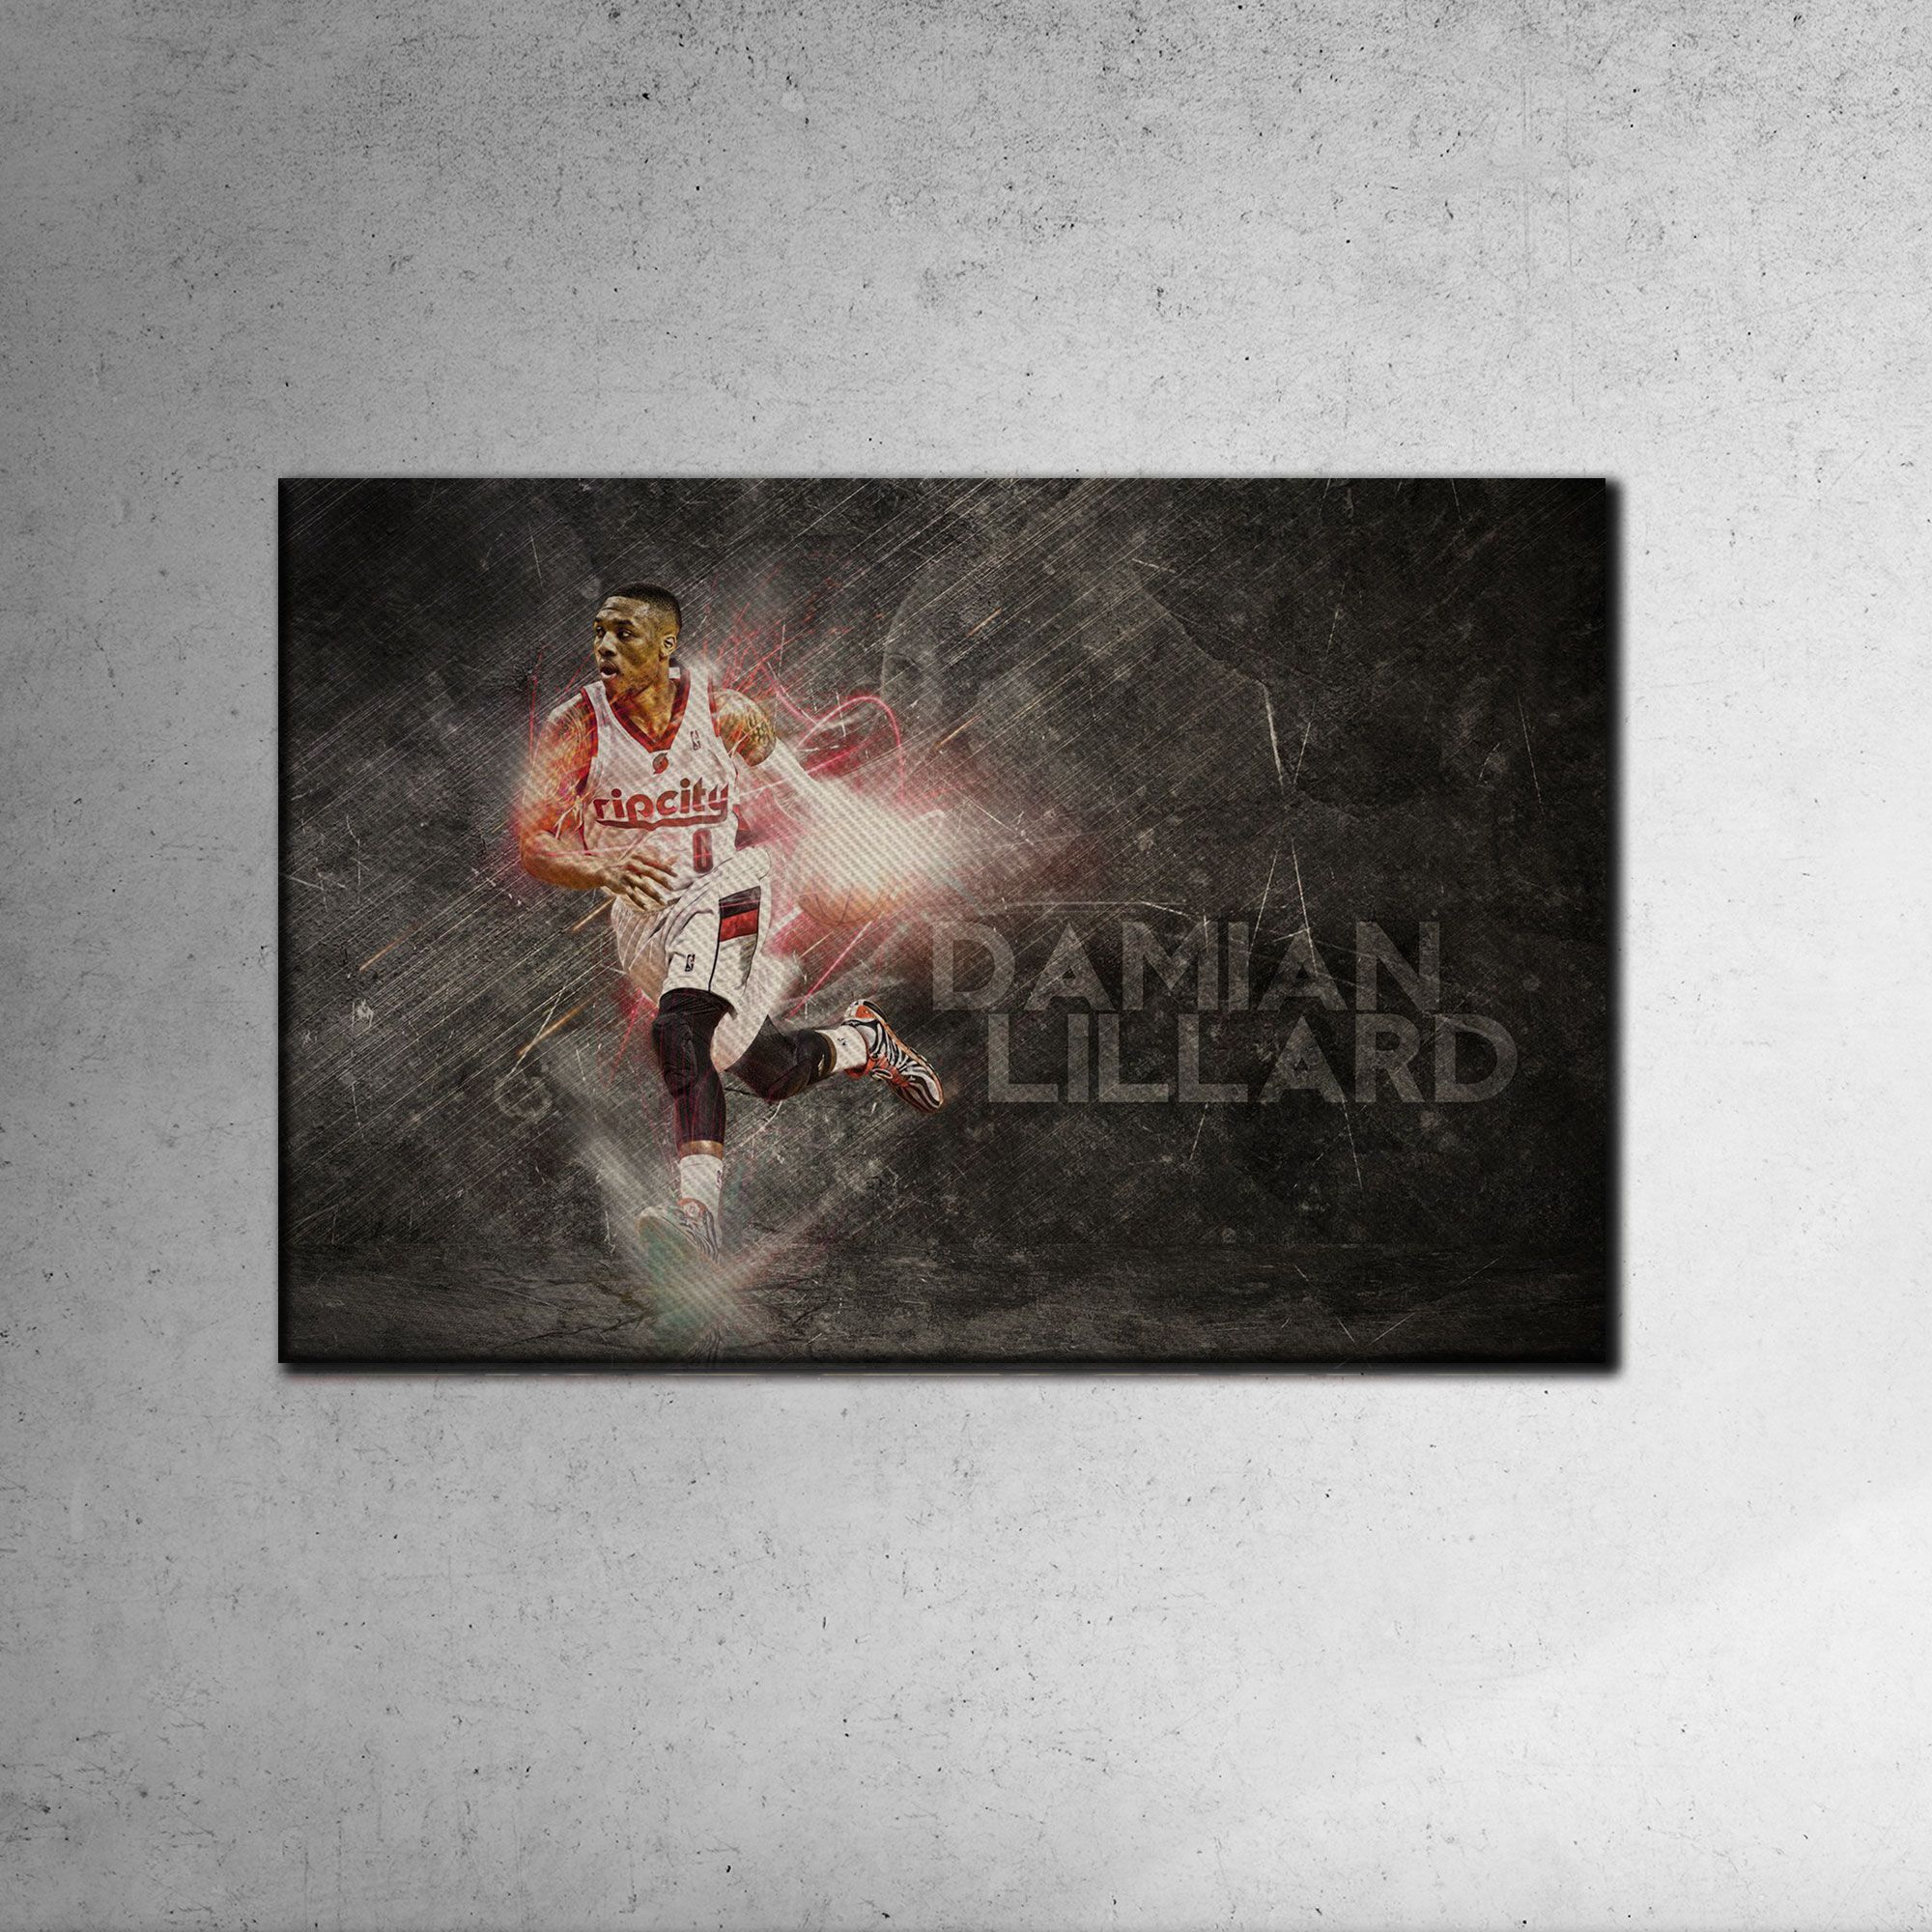 Damian Lillard Canvas Tablo (Nba-canvas-damian3)